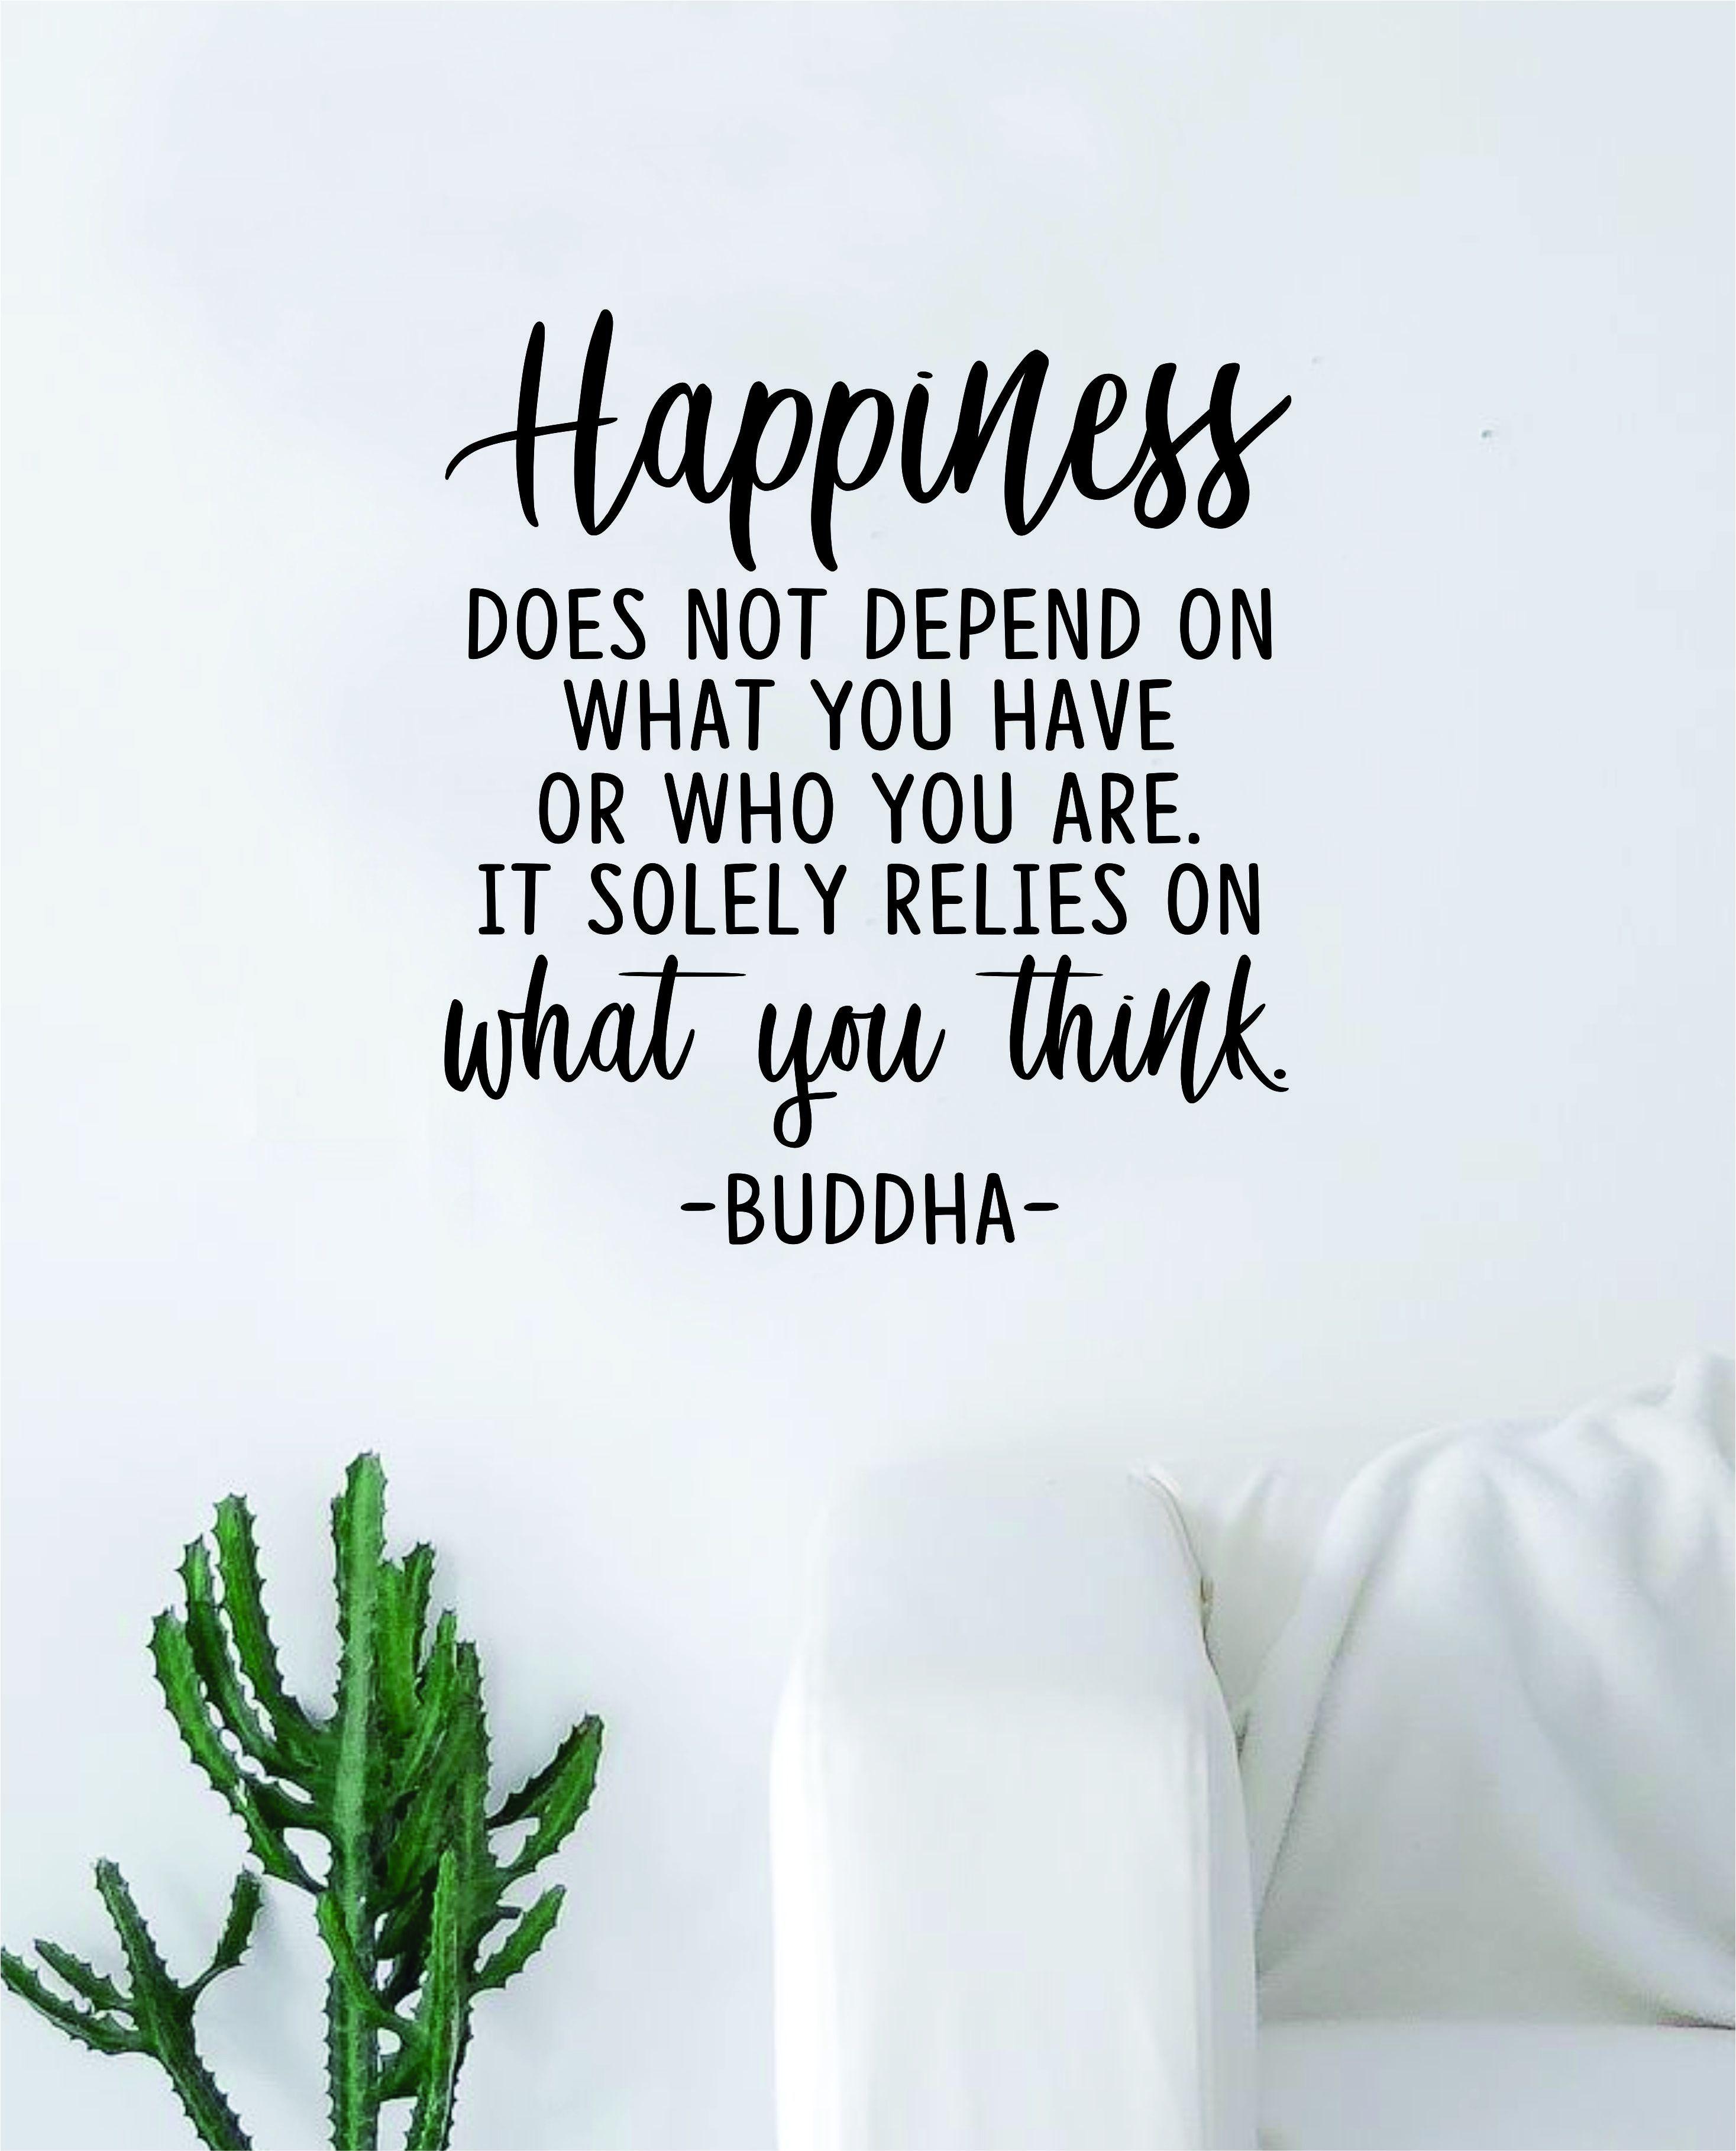 Buddha Happiness v3 Quote Decal Sticker Wall Vinyl Art Decor Bedroom Living Room Namaste Yoga Mandala Om Meditate Zen Lotus Inspirational Soul Love Peace - black